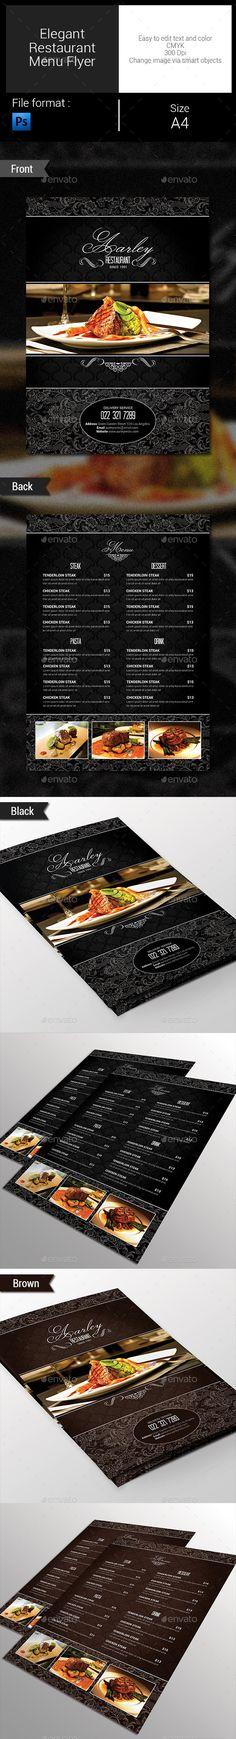 Elegant Restaurant Menu Flyer Template #design Download: http://graphicriver.net/item/-elegant-restaurant-menu-flyer/9671212?ref=ksioks